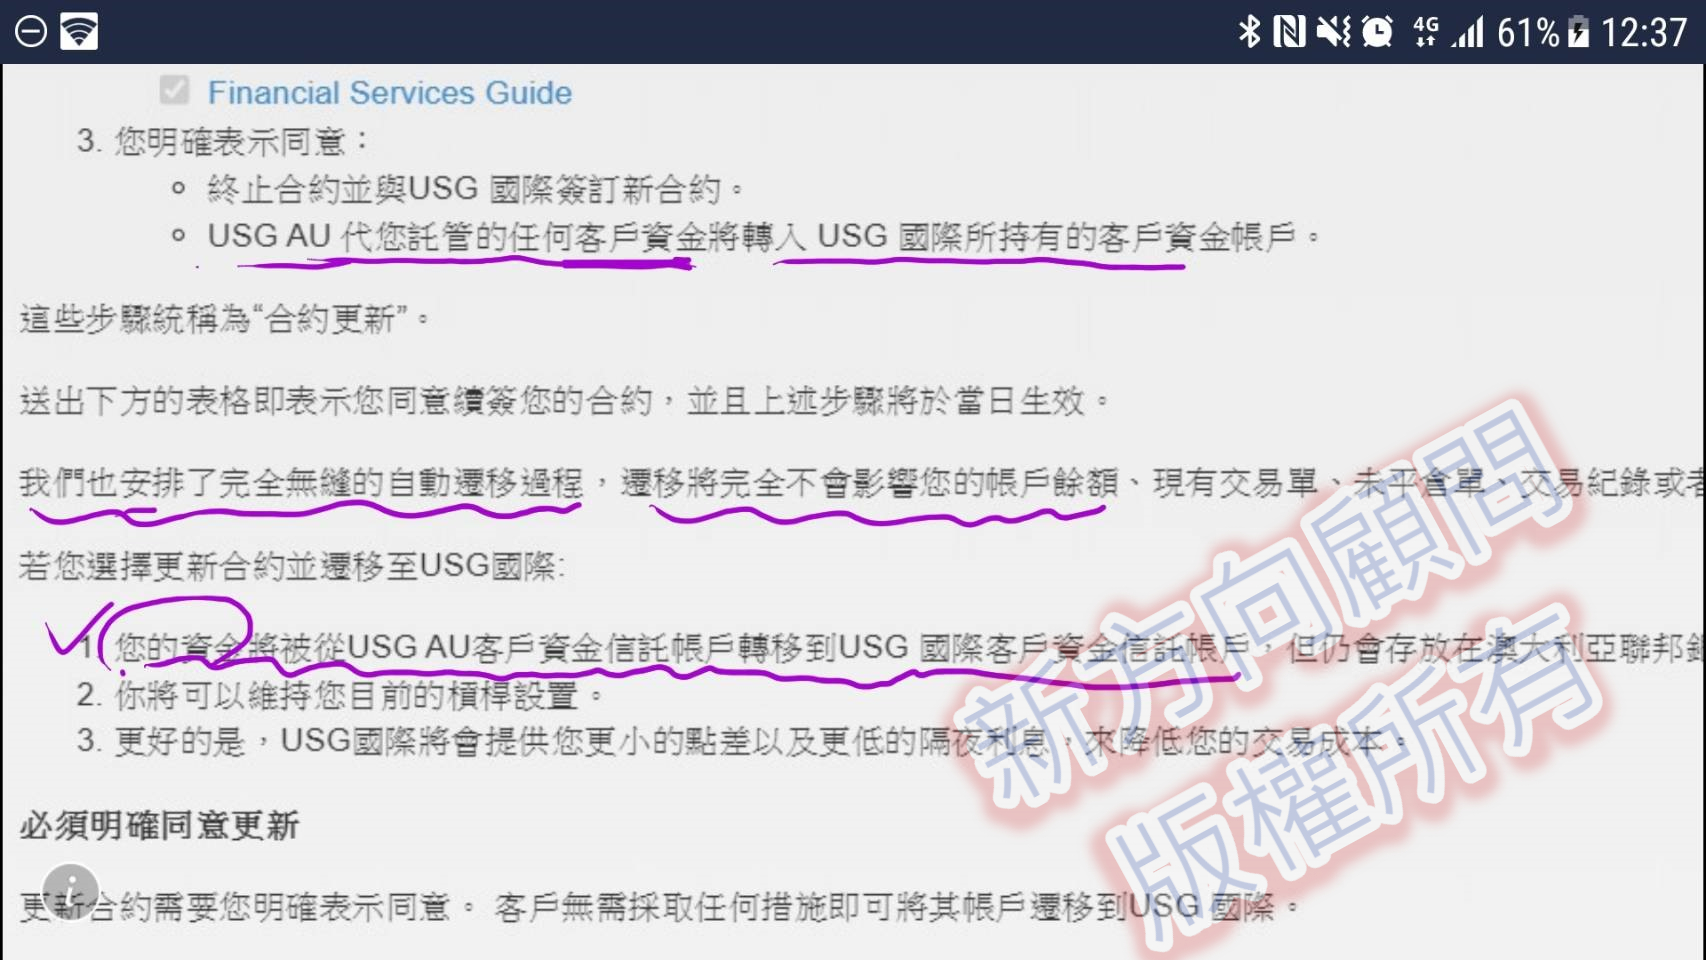 USG資金及監管轉移